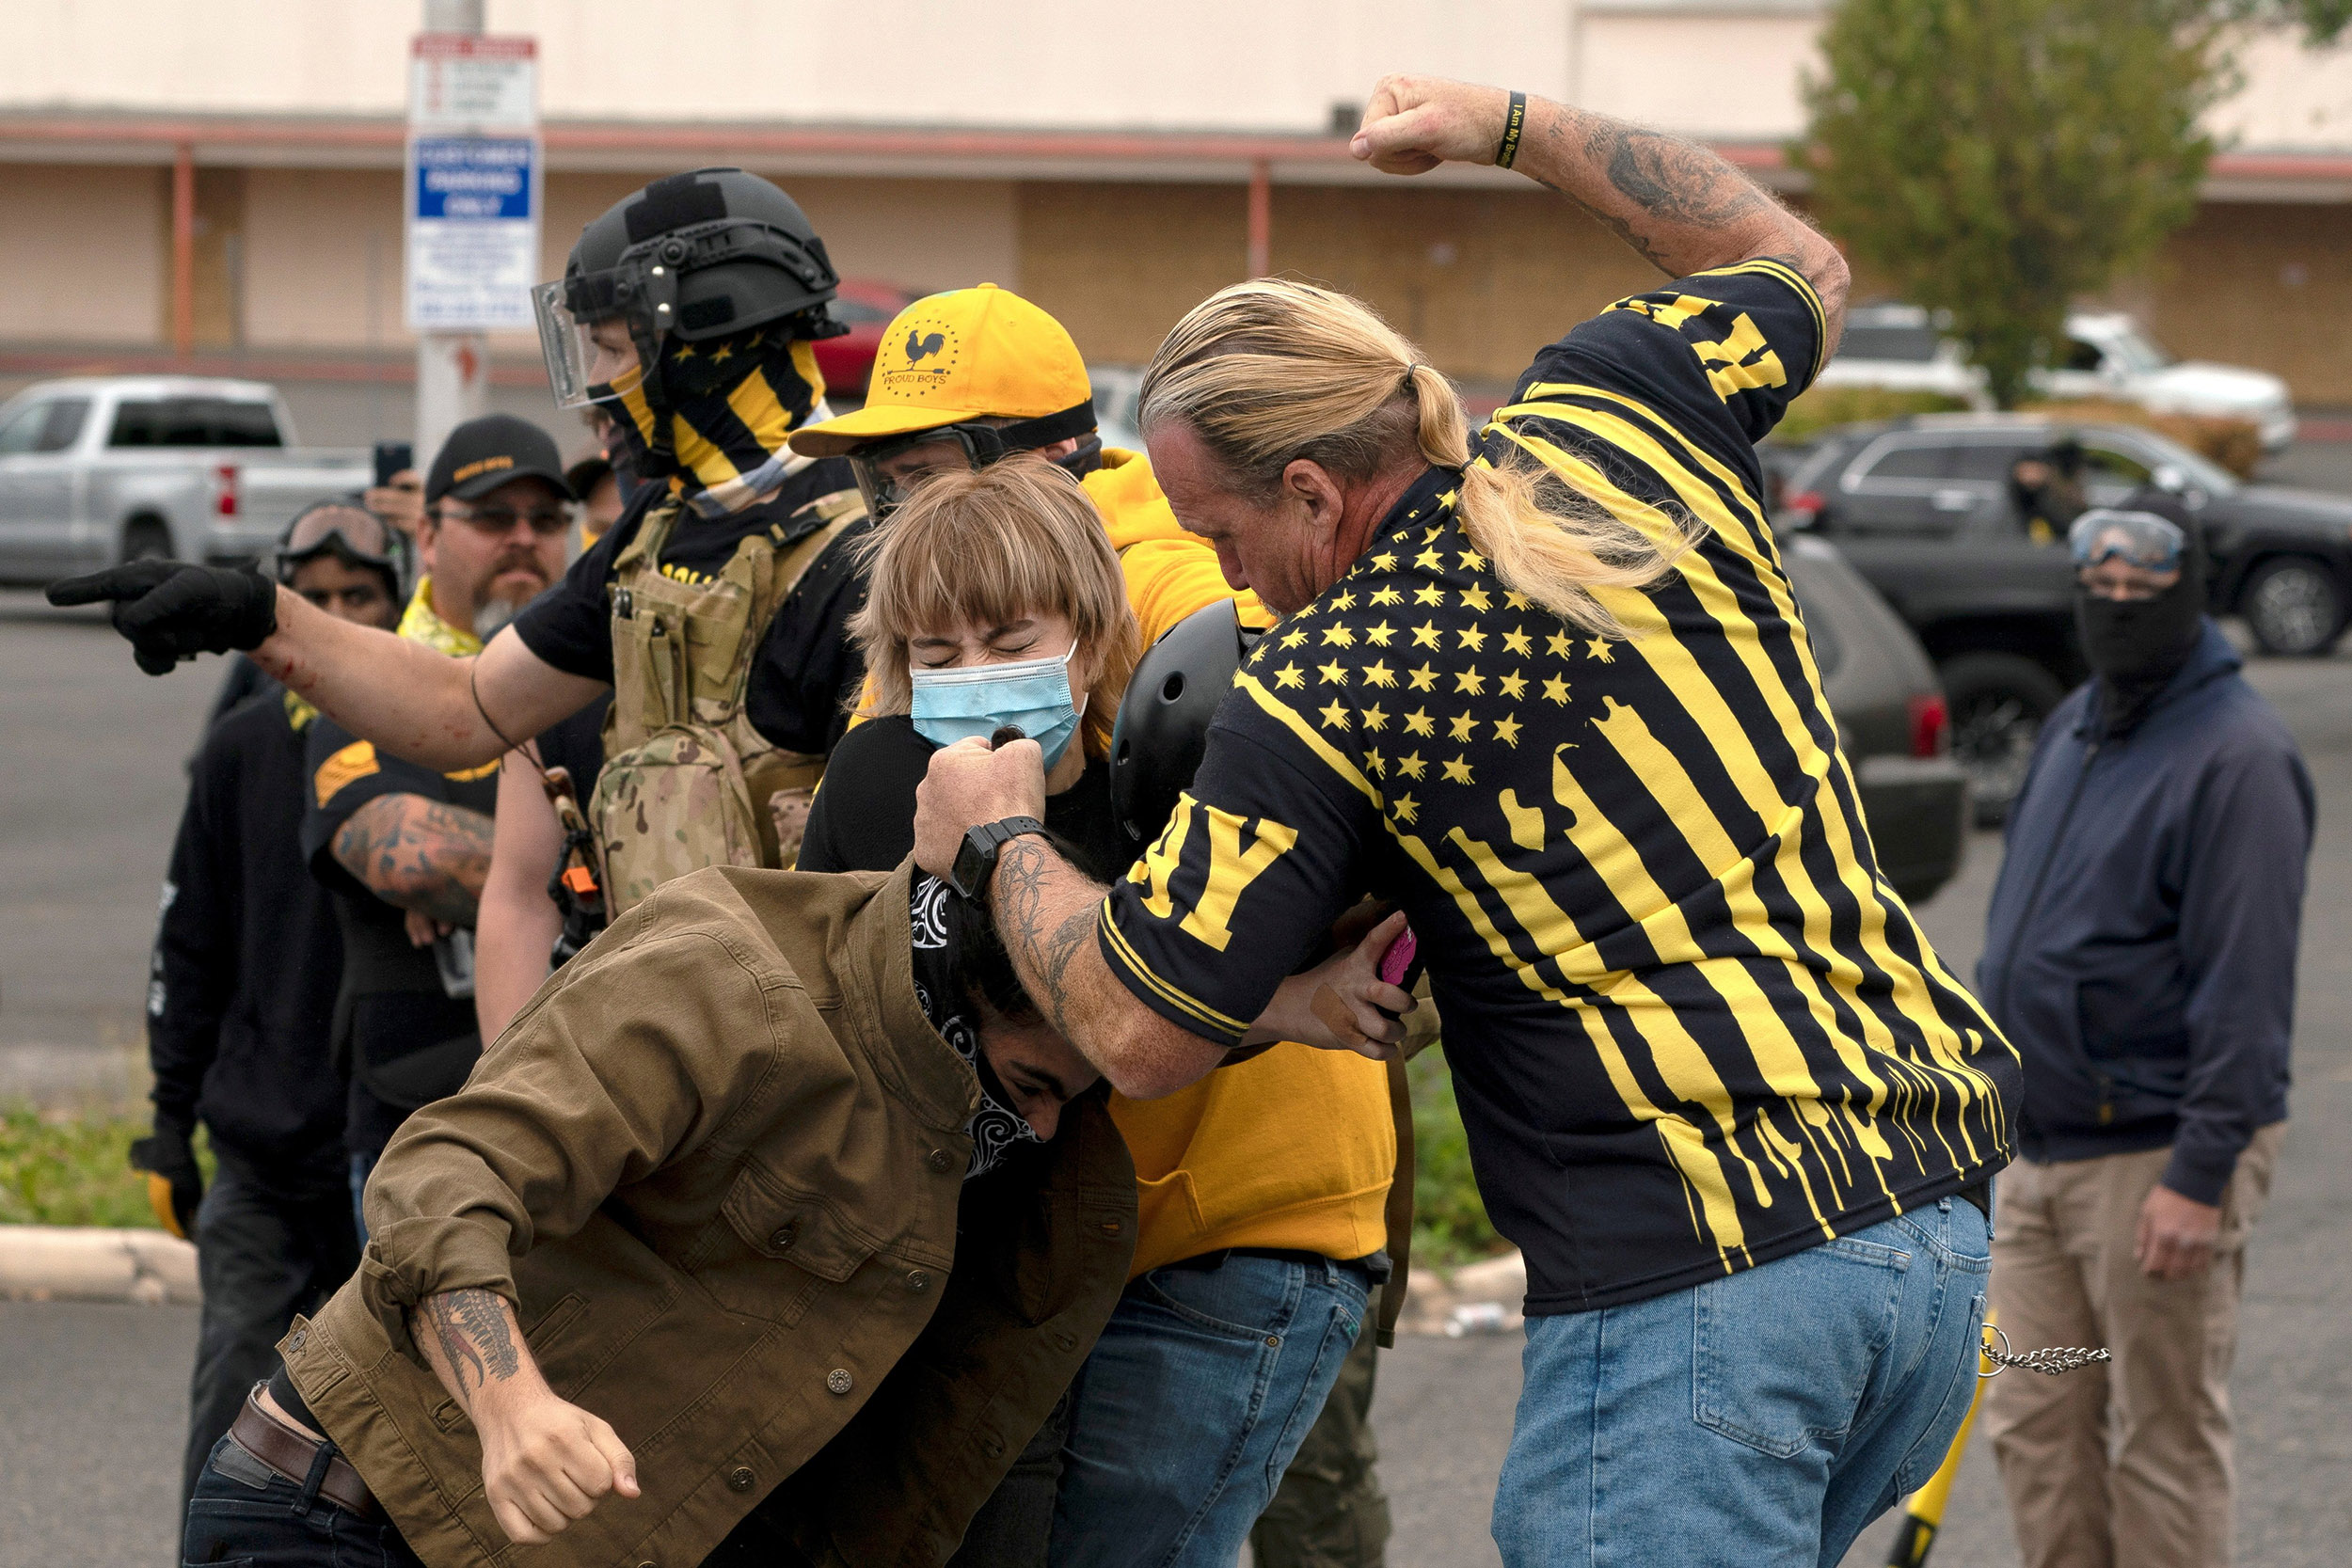 Gunfire, brawls as far-right and far-left protest groups clash in Portland